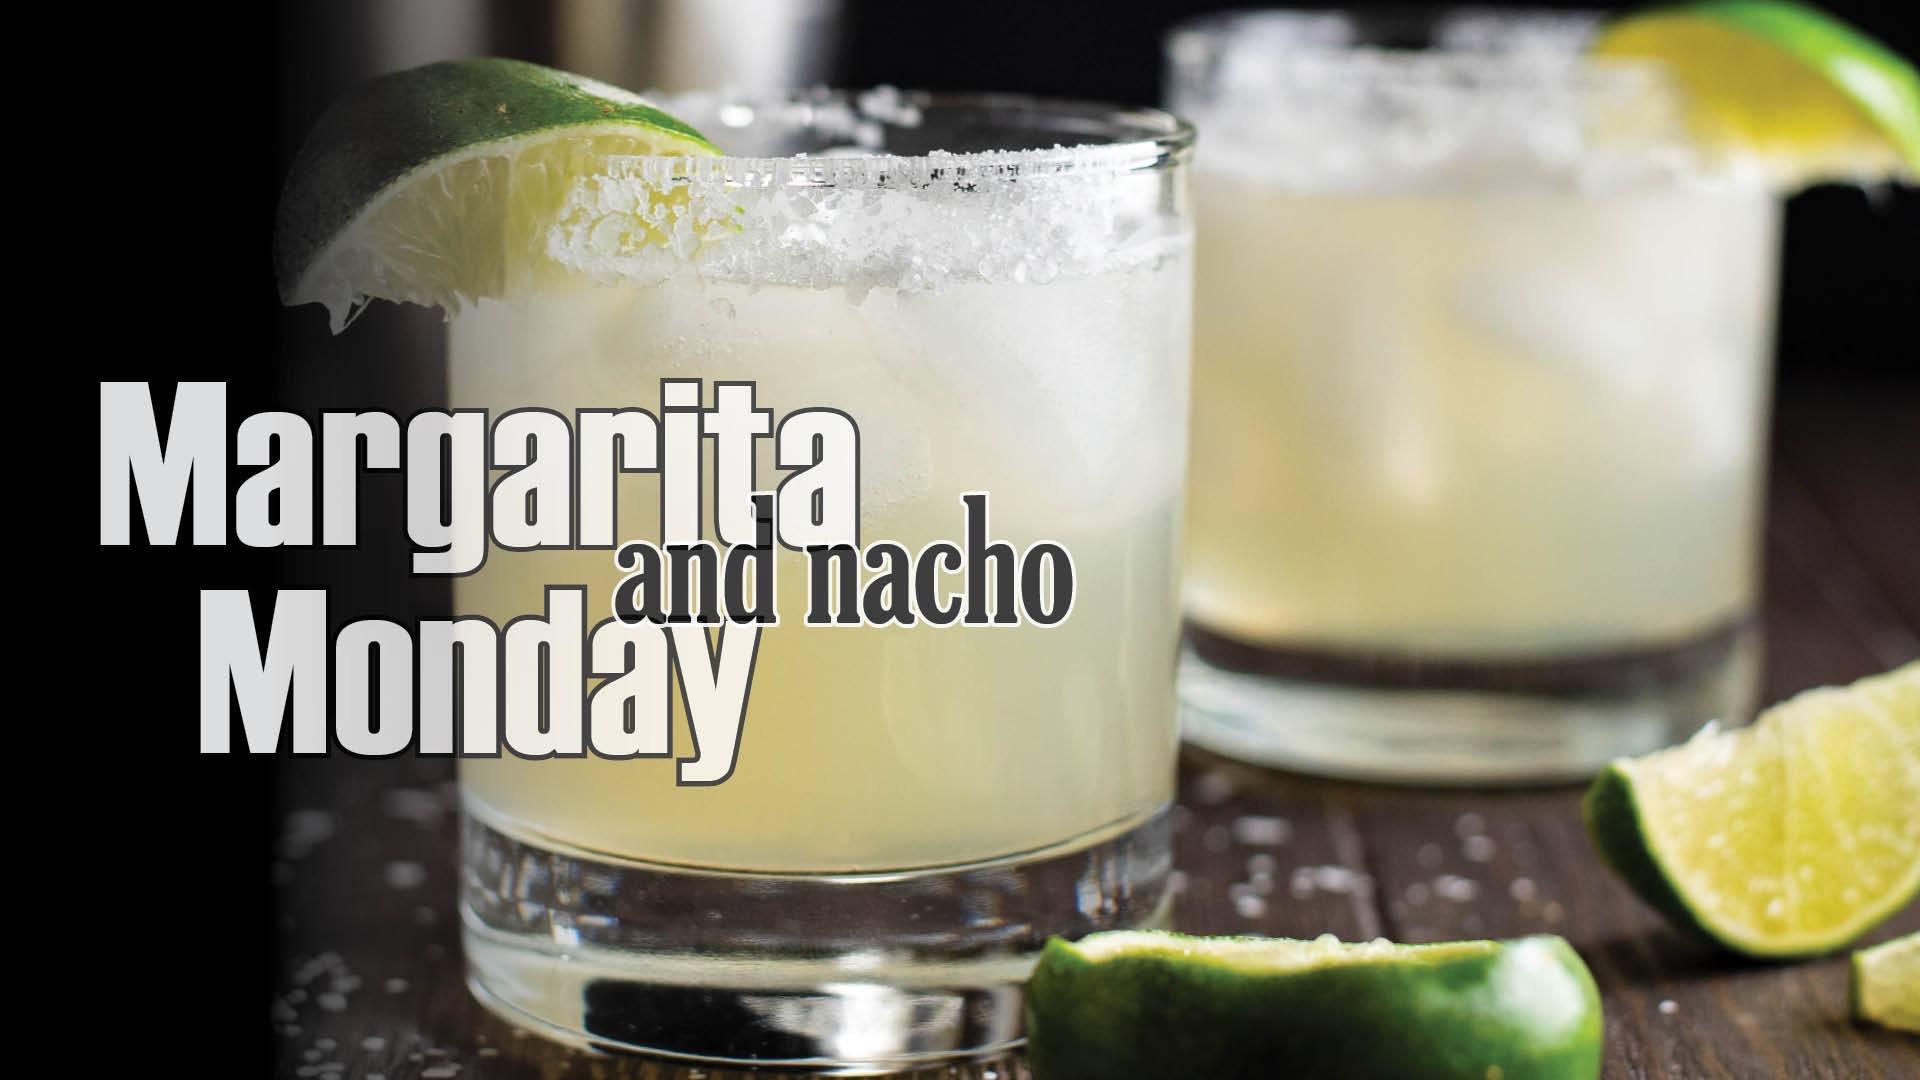 Margarita (and nacho) Monday // Every Monday